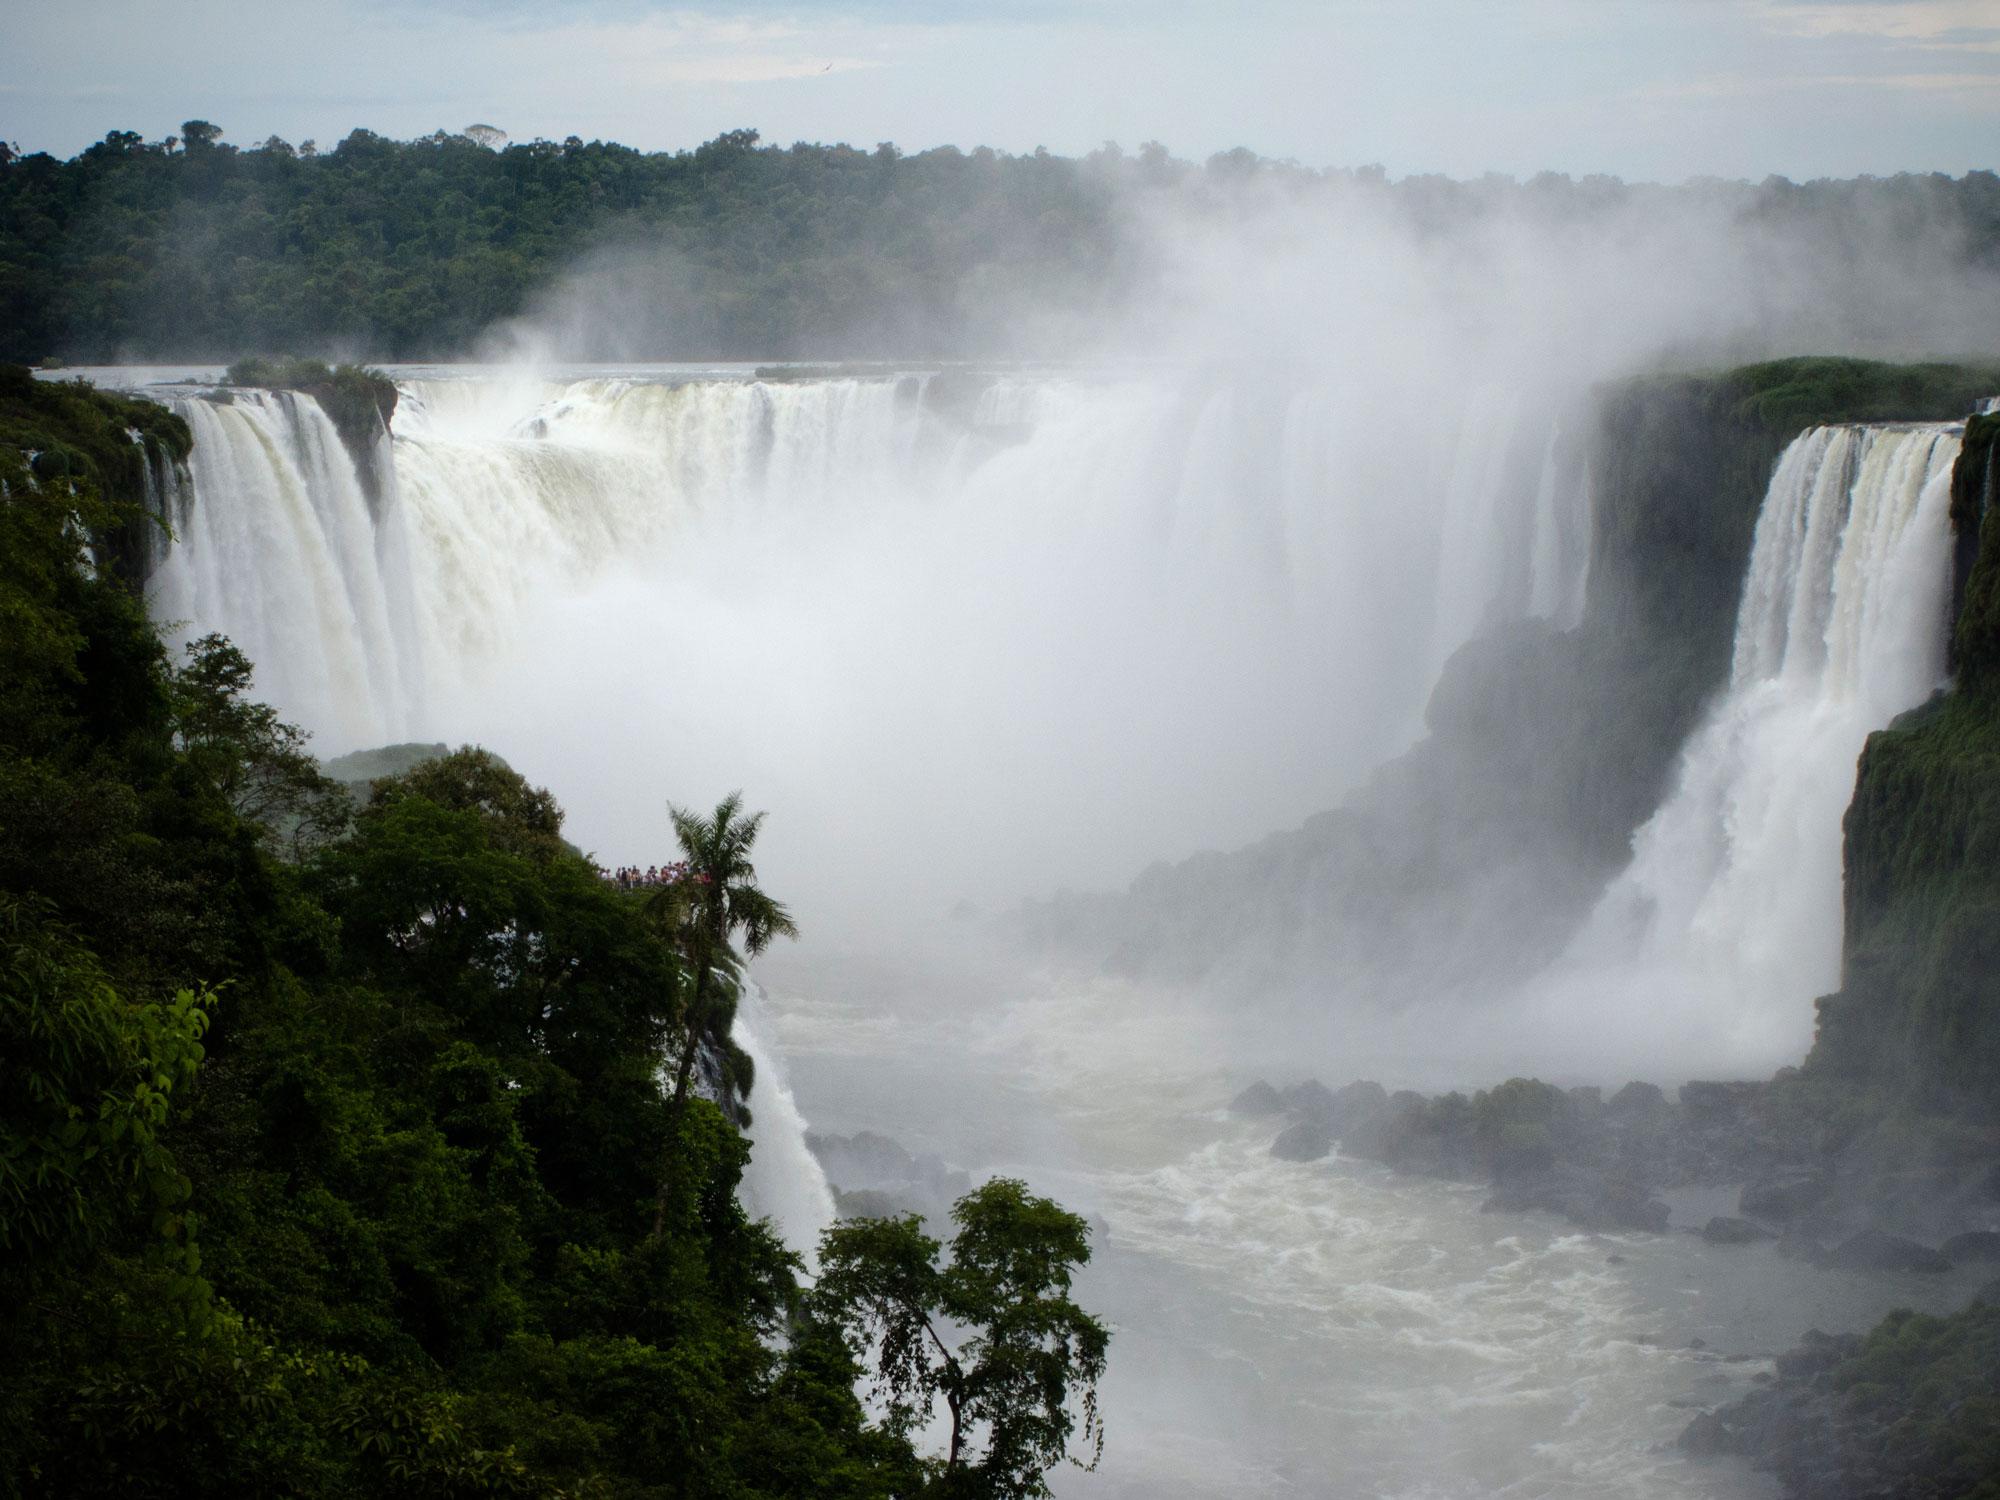 Iguazu falls garganta brasilian side